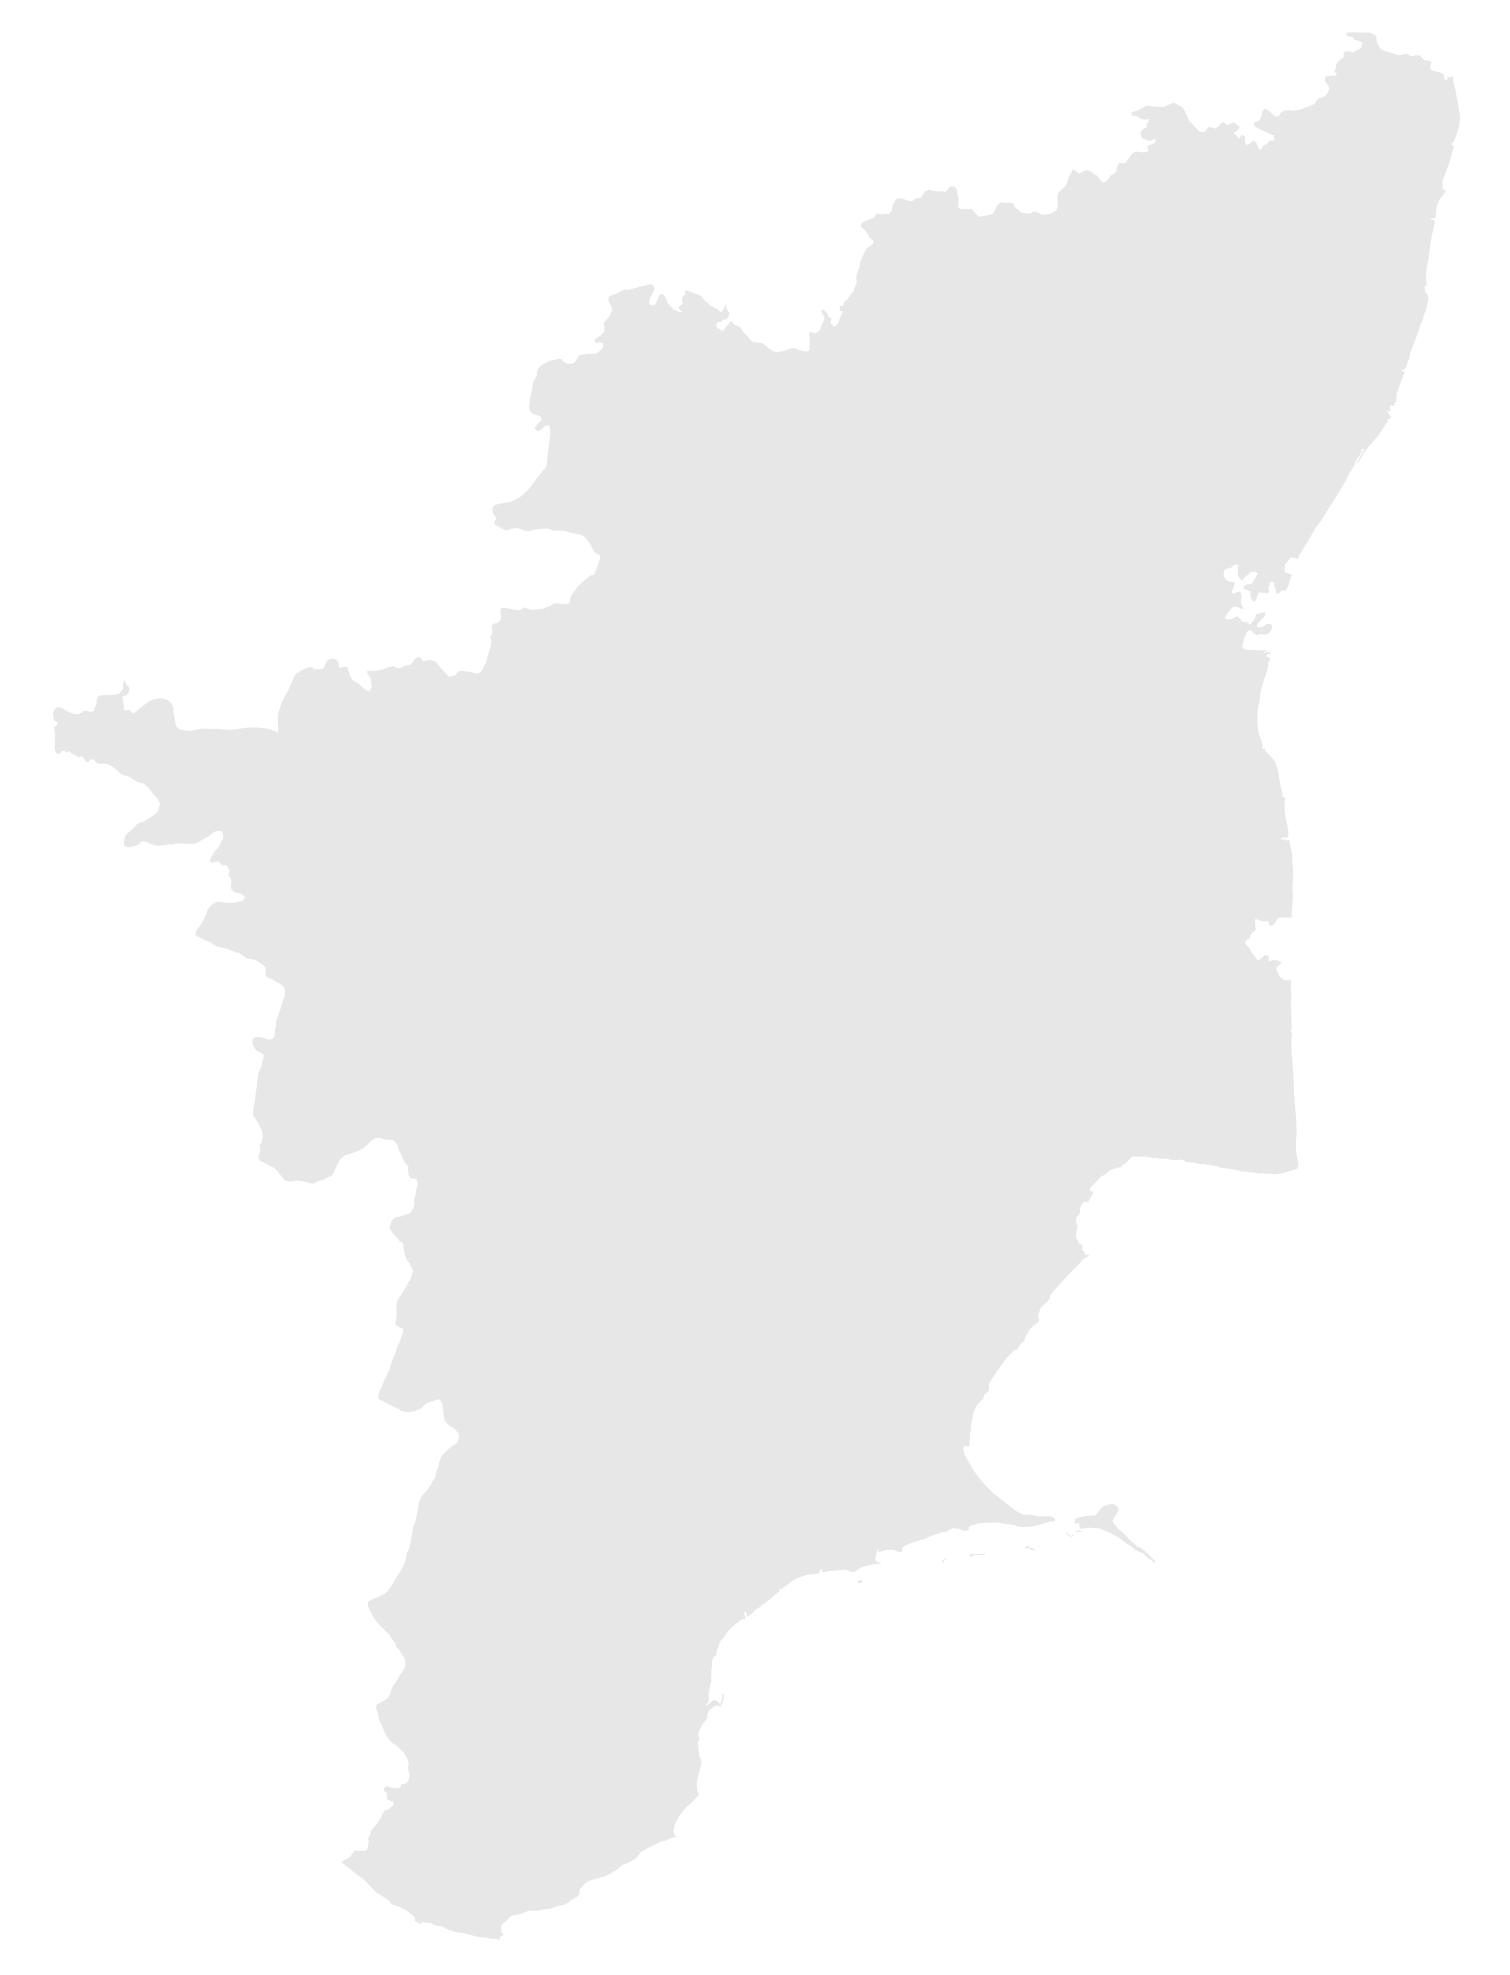 Interesting Tamil Nadu Outline Map Tamil Nadu Map Clipart.